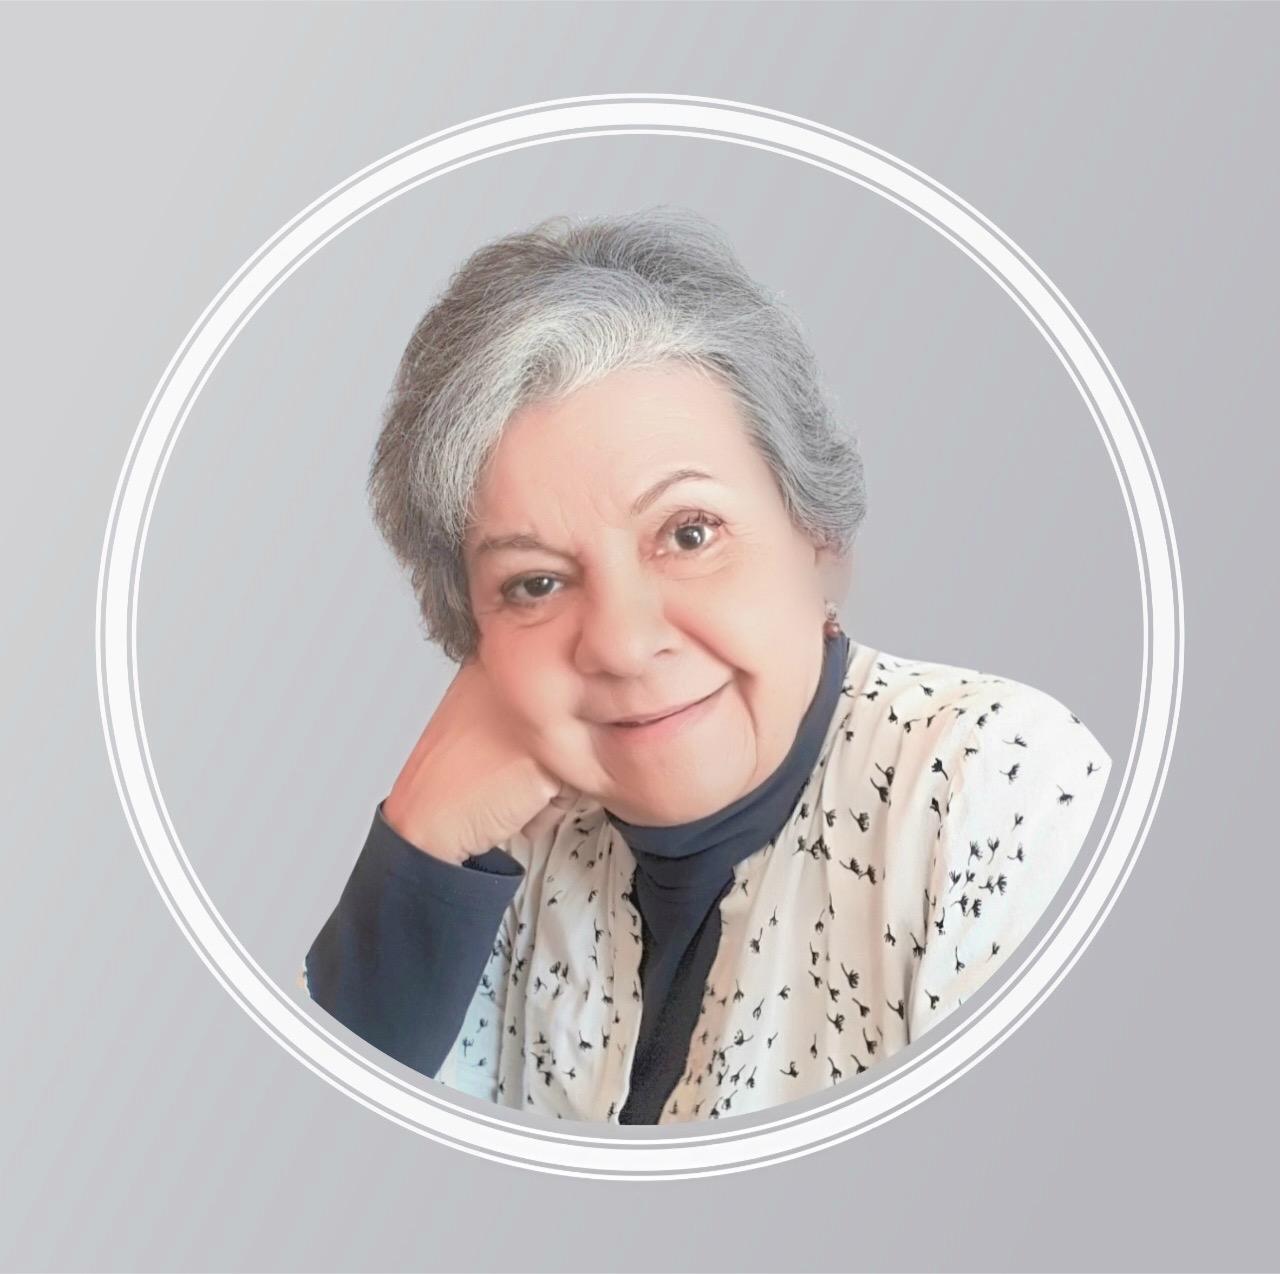 Catalina Gandica de Gisbert